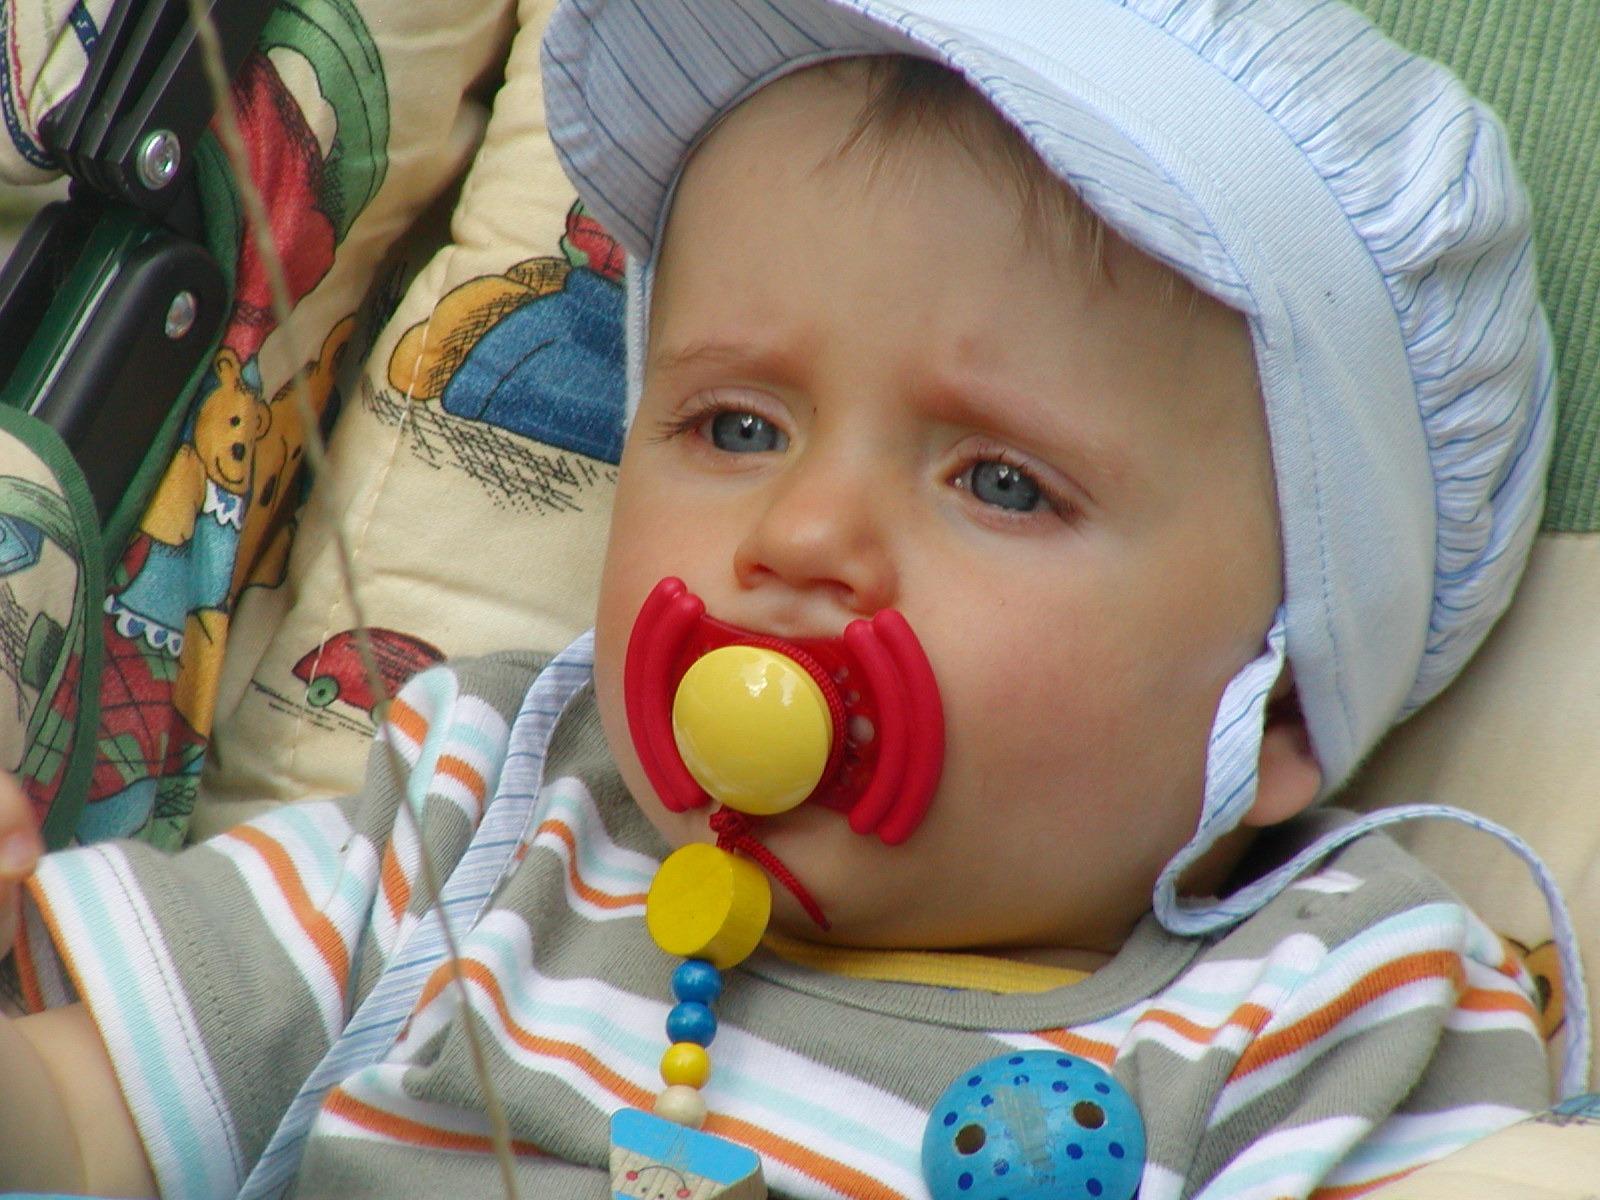 persona jugar niño bebé expresión facial producto nariz infantil niñito  Organo niño pequeño chupete cochecito de 5f89c855a53